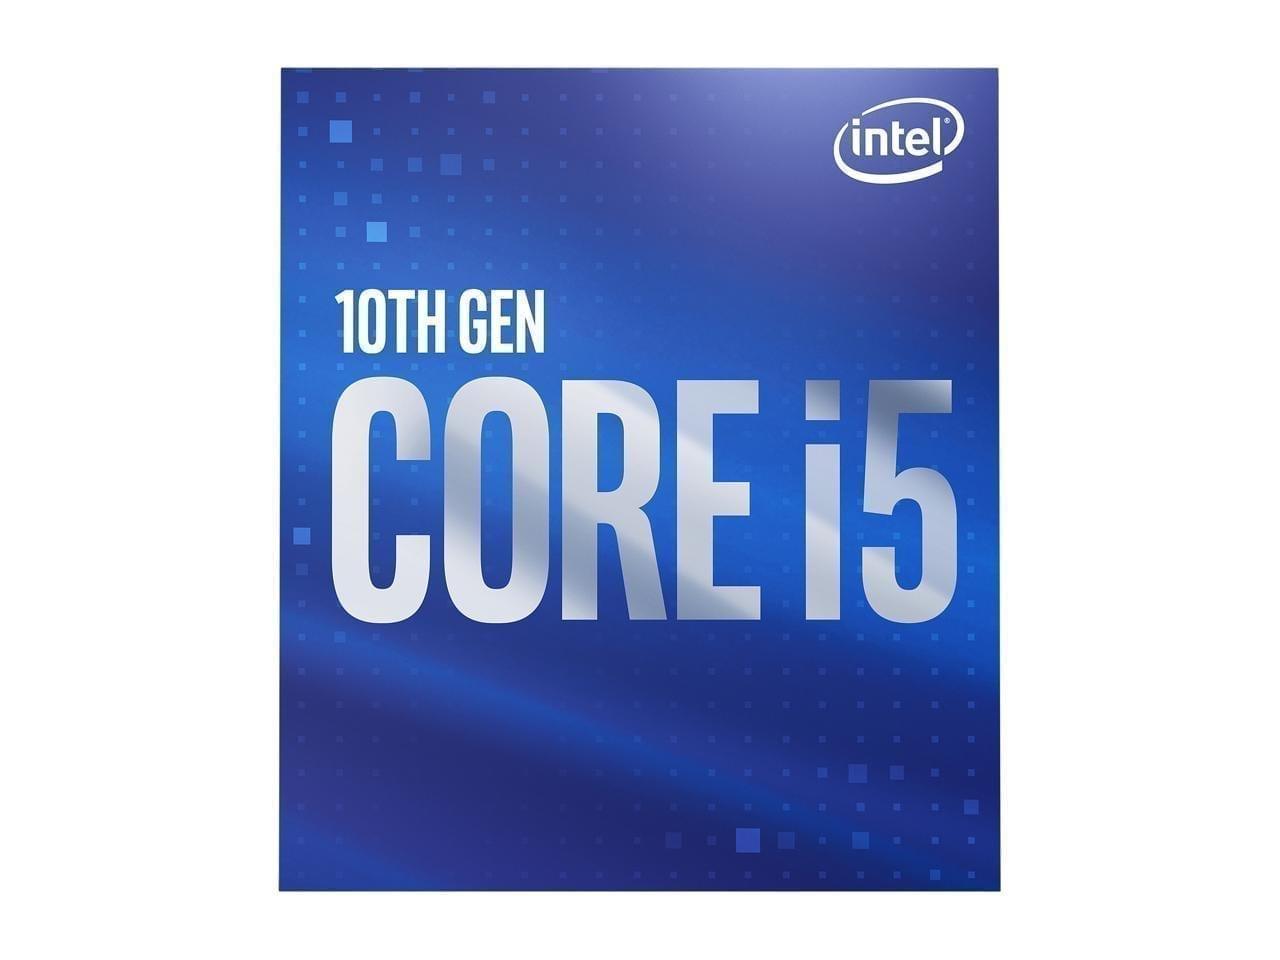 Intel Core i5-10400 Comet Lake 6-Core 2.9 GHz LGA 1200 65W BX8070110400 Desktop Processor Intel UHD Graphics 630 8